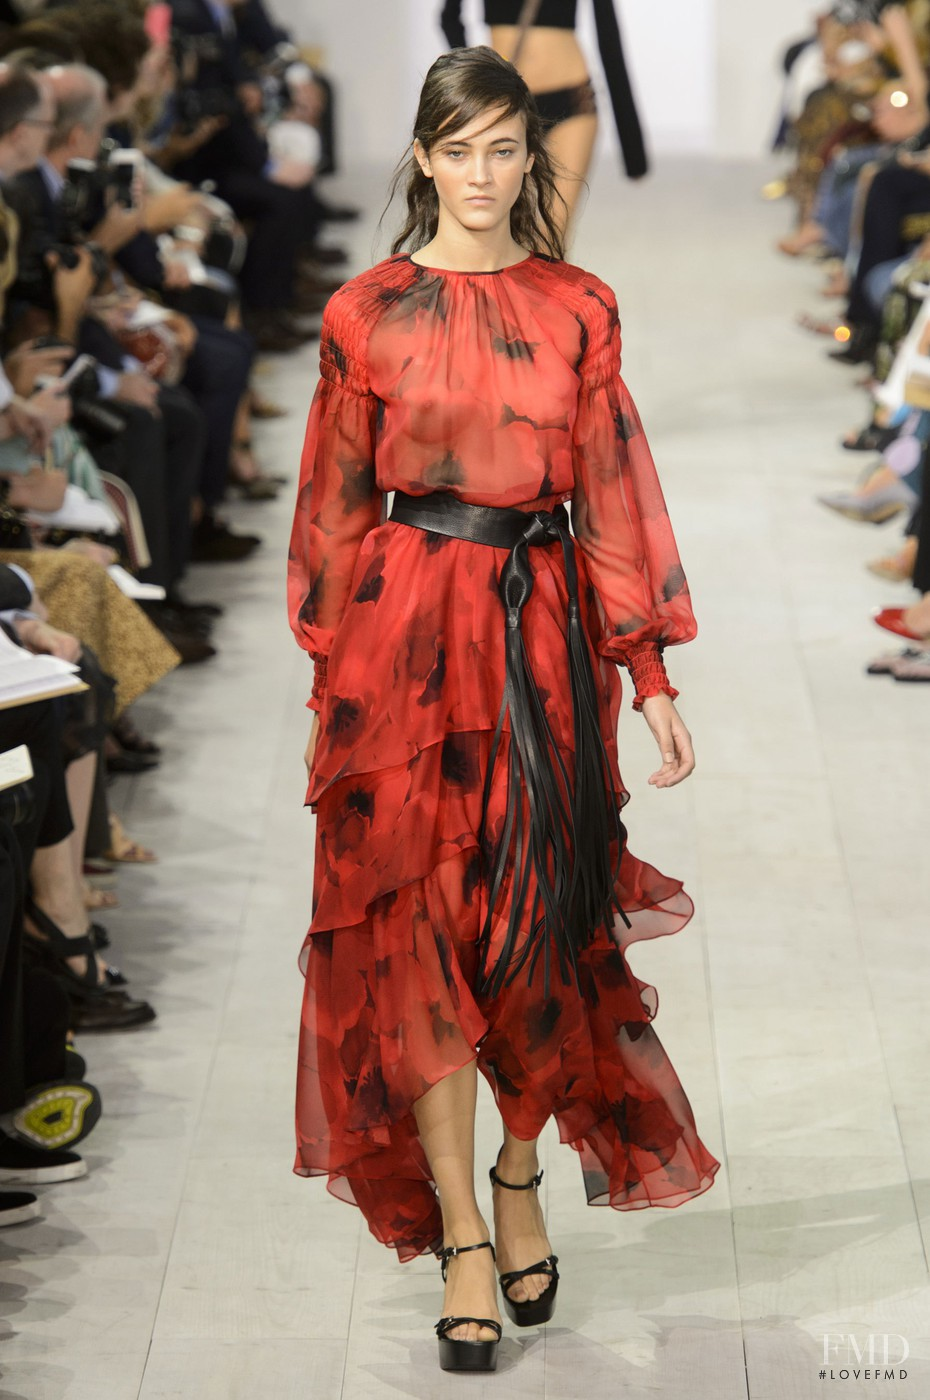 Spanish Fashion: Ladies Edition - Young Adventuress 44